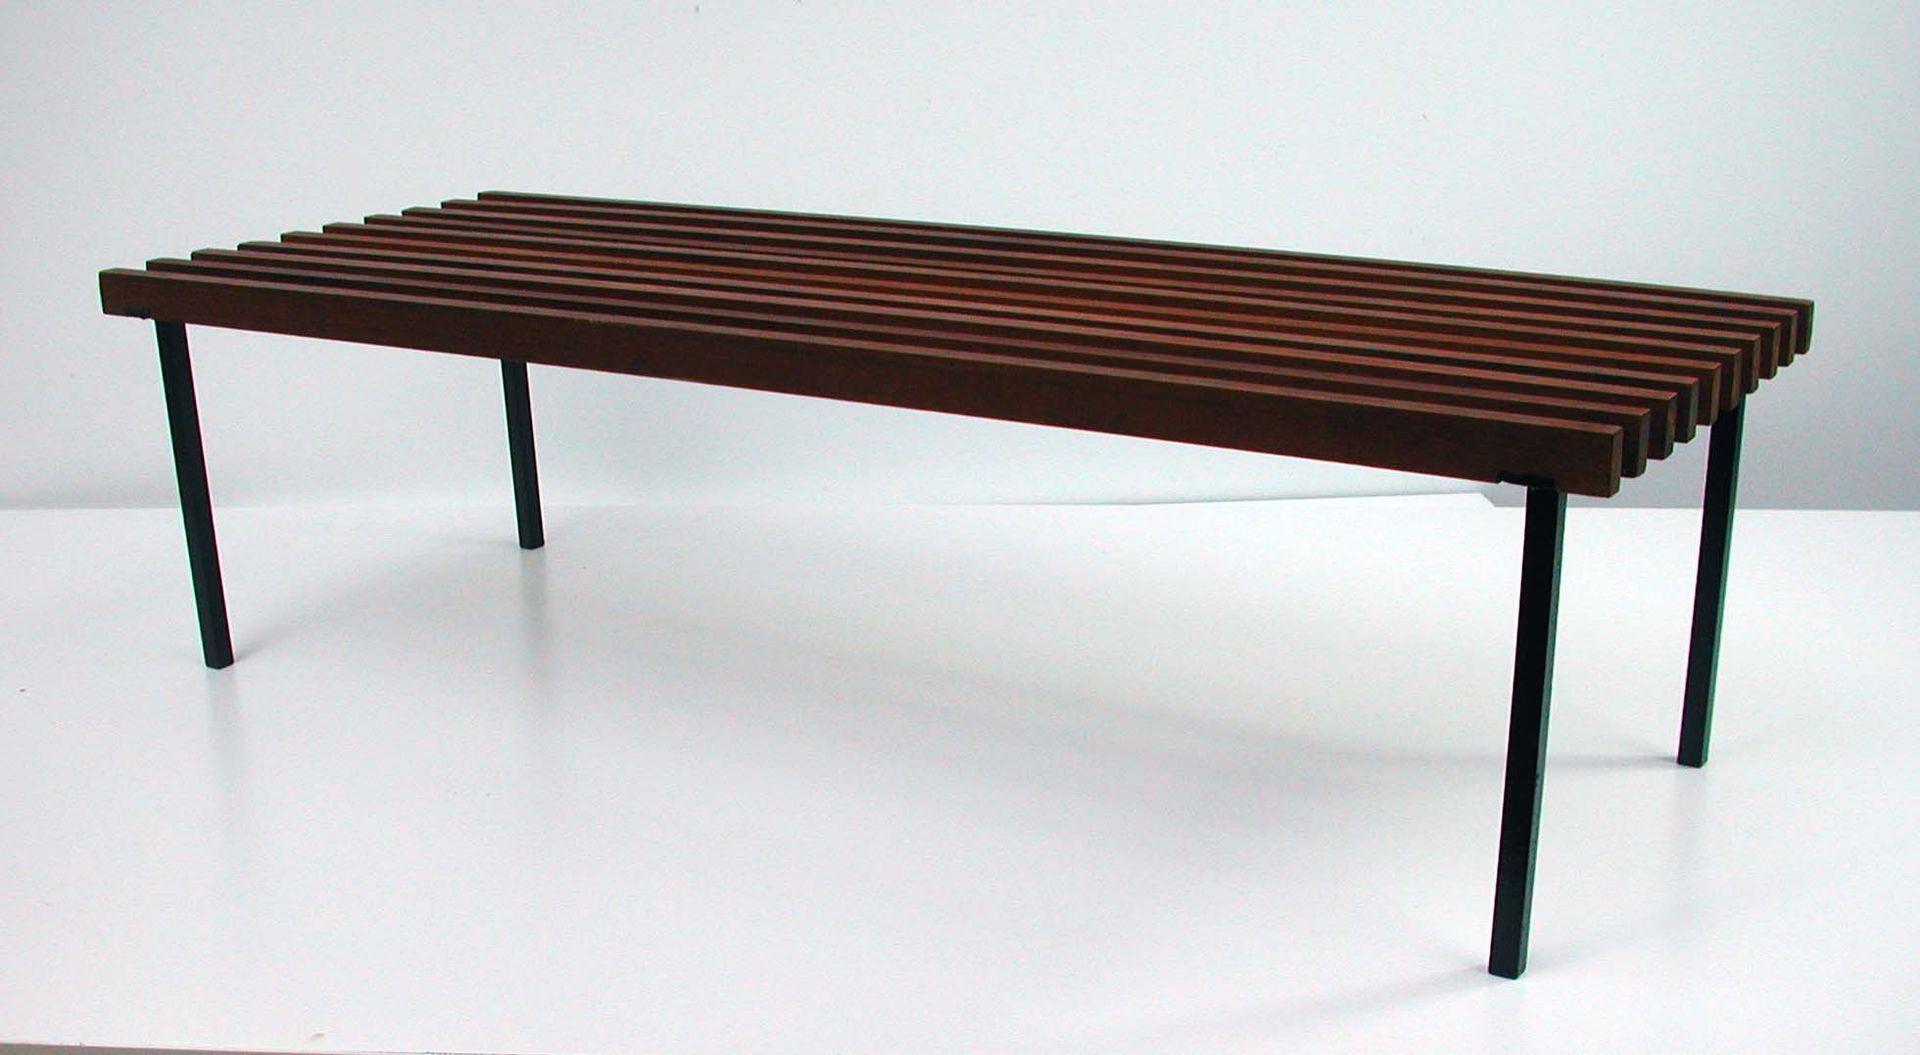 Vintage Danish Teak Bench For Sale At Pamono